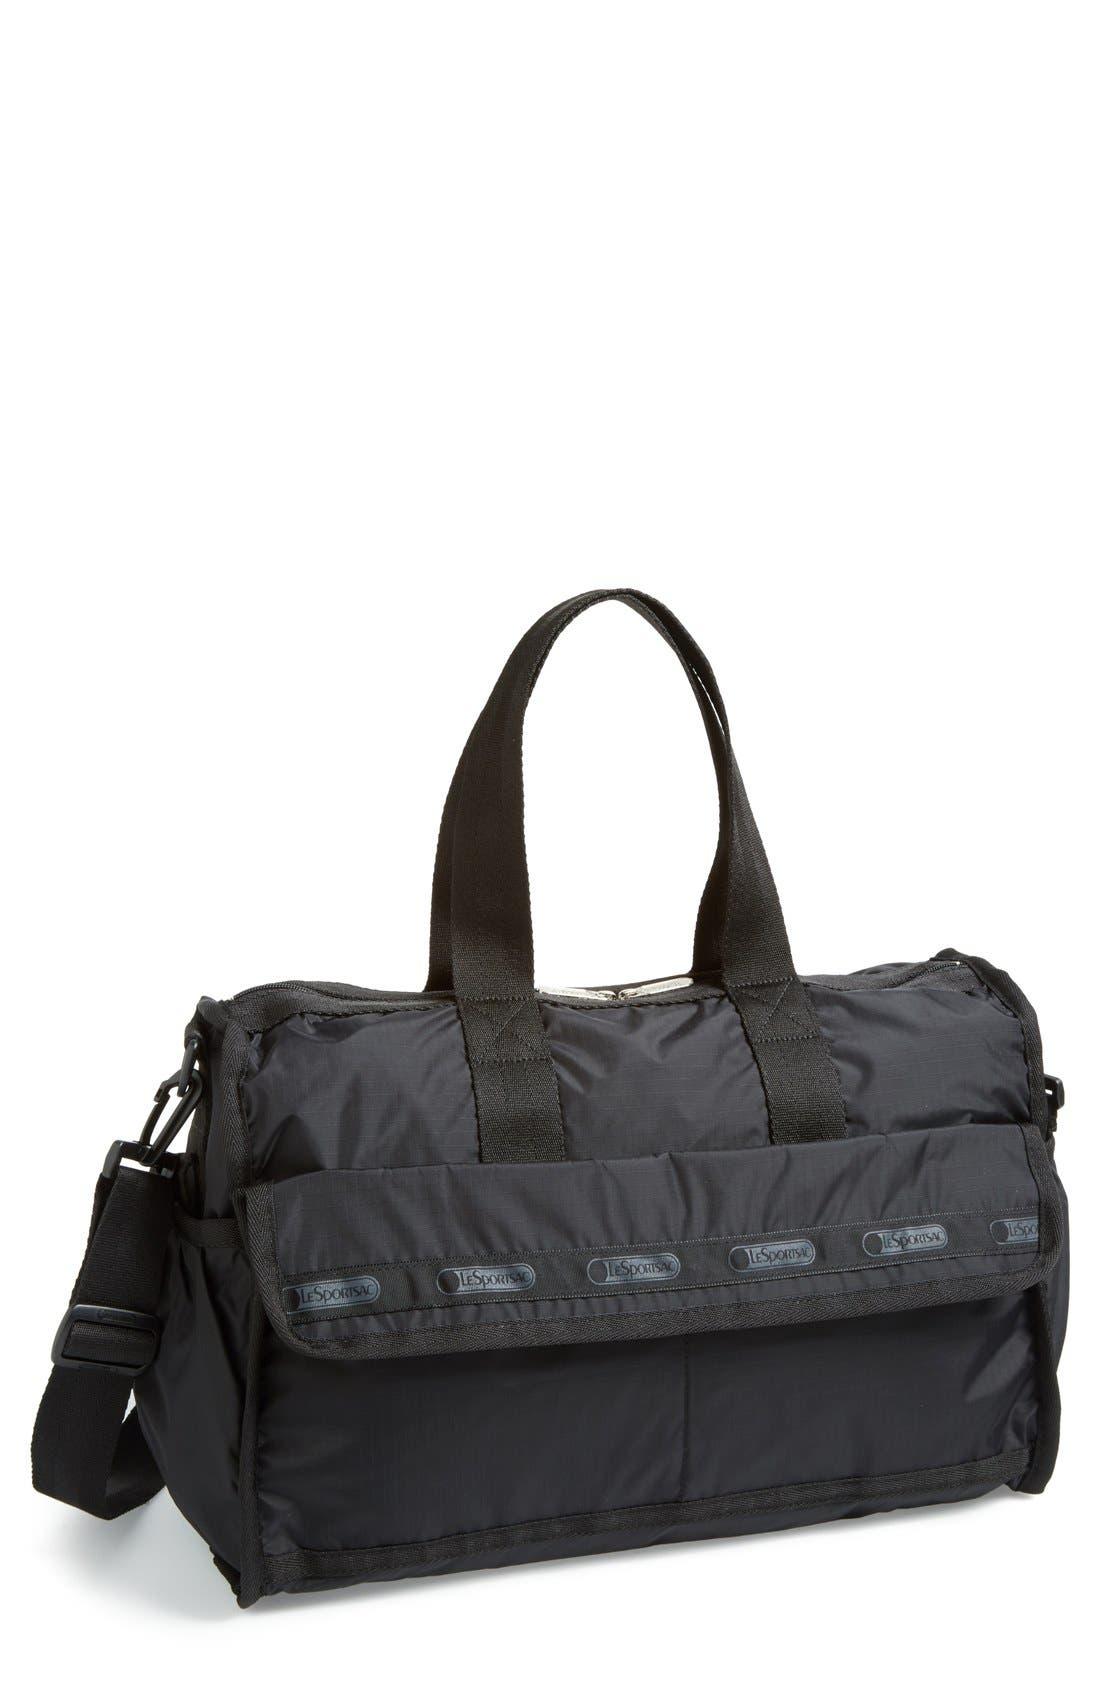 Alternate Image 1 Selected - LeSportsac 'Travel' Baby Bag